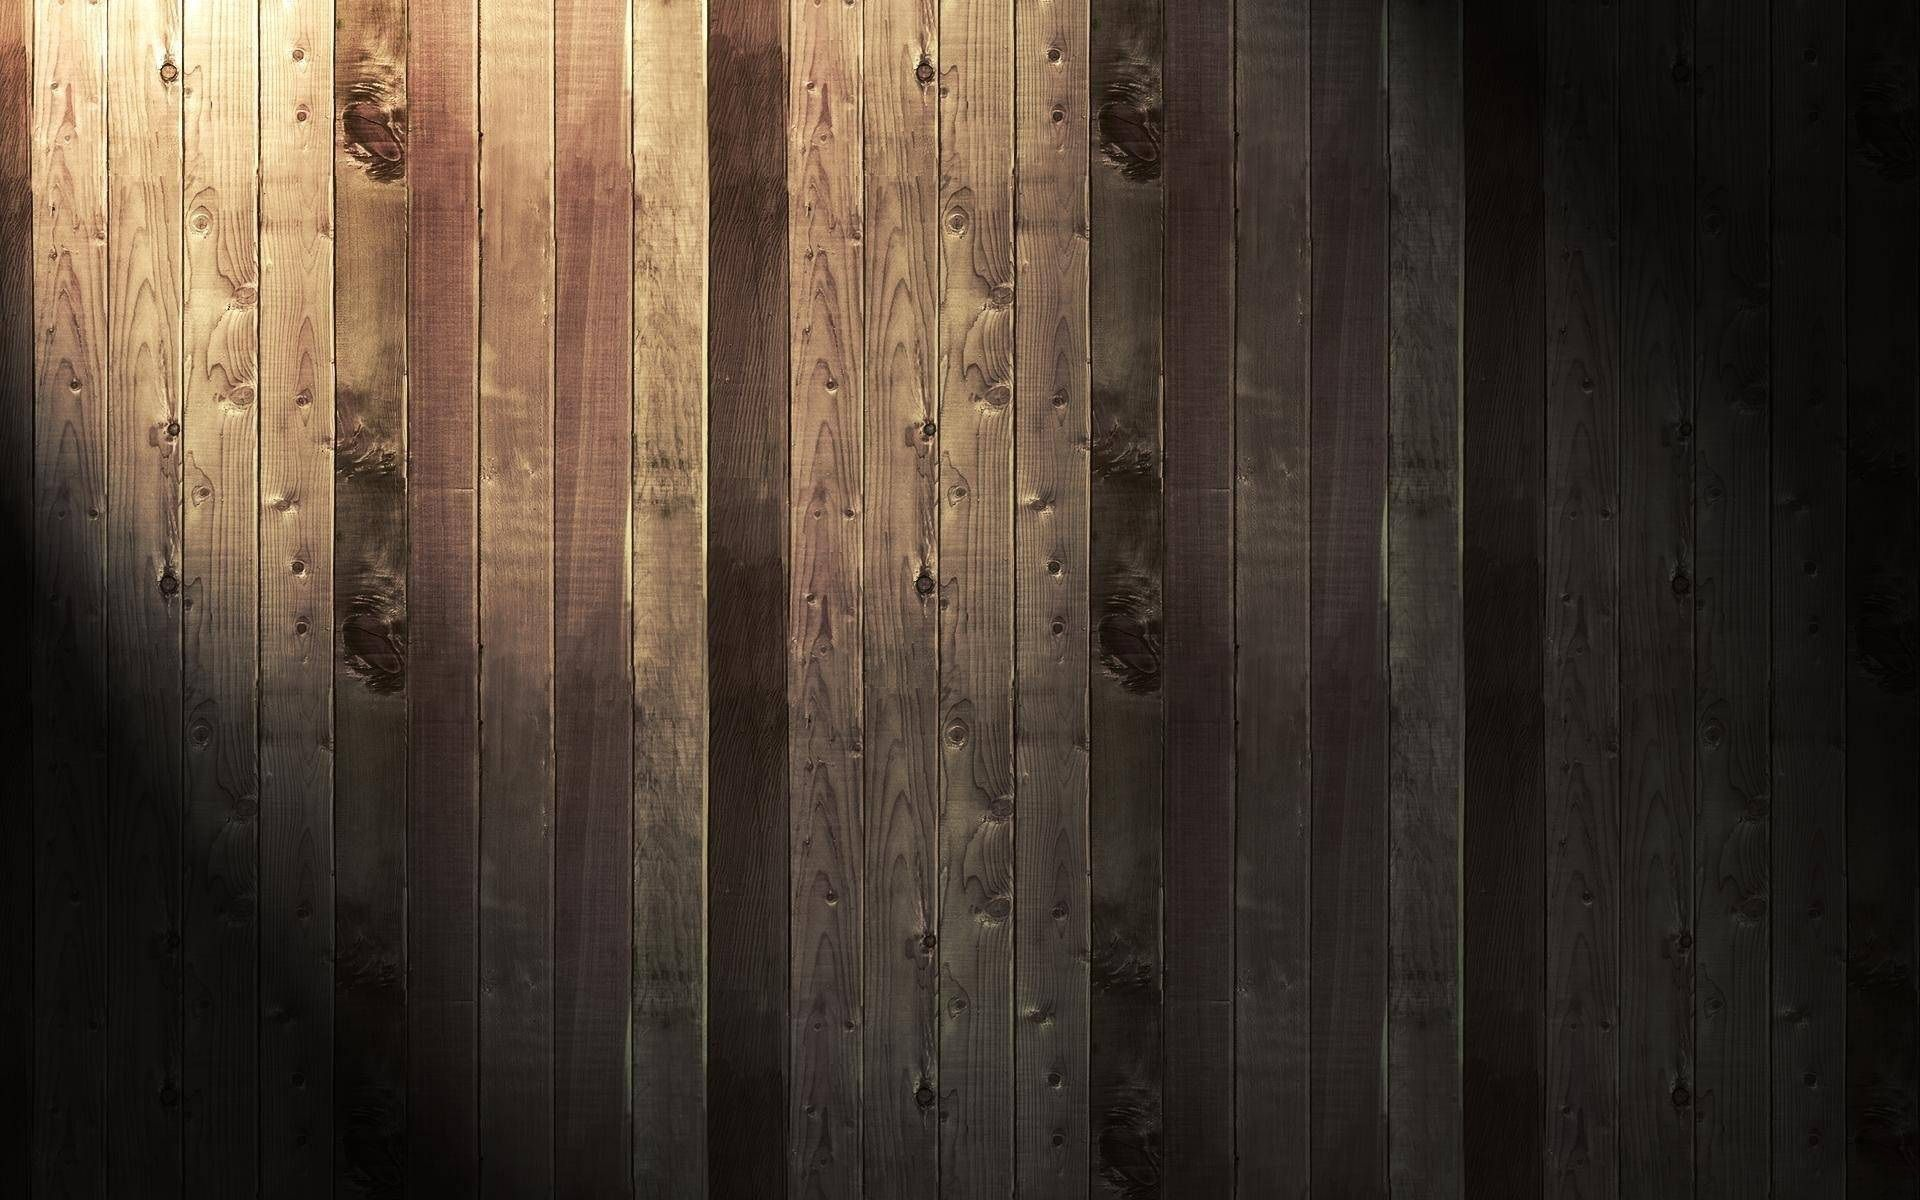 Hd wallpaper wood - Wood Grain Wallpapers Hd Wallpaper